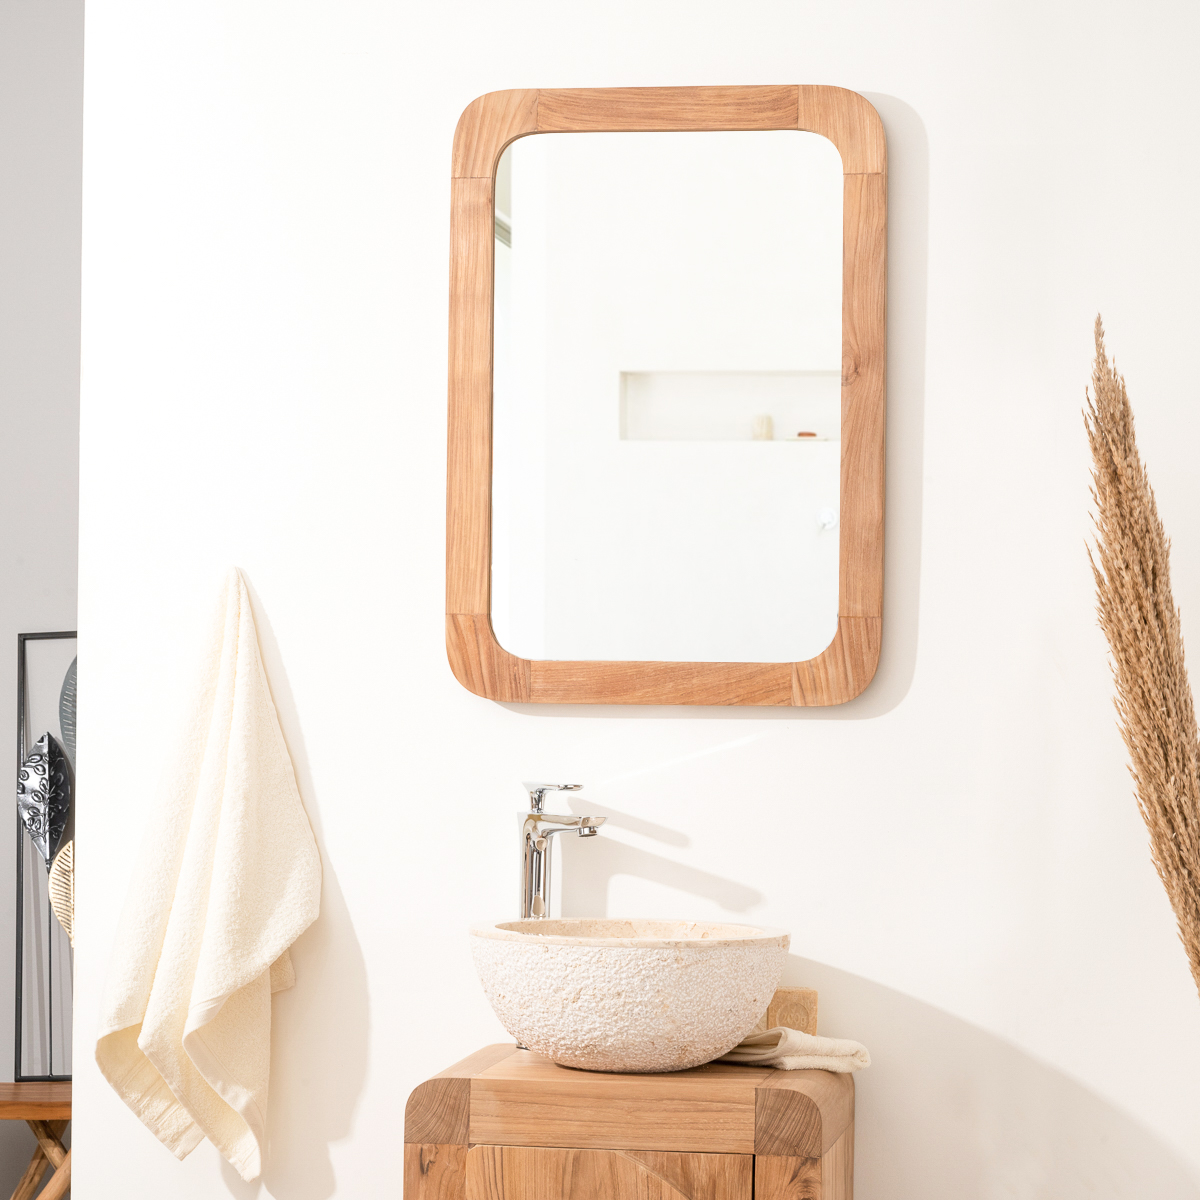 Miroir r tro en teck massif 70 cm x 50cm for Miroir salle de bain teck